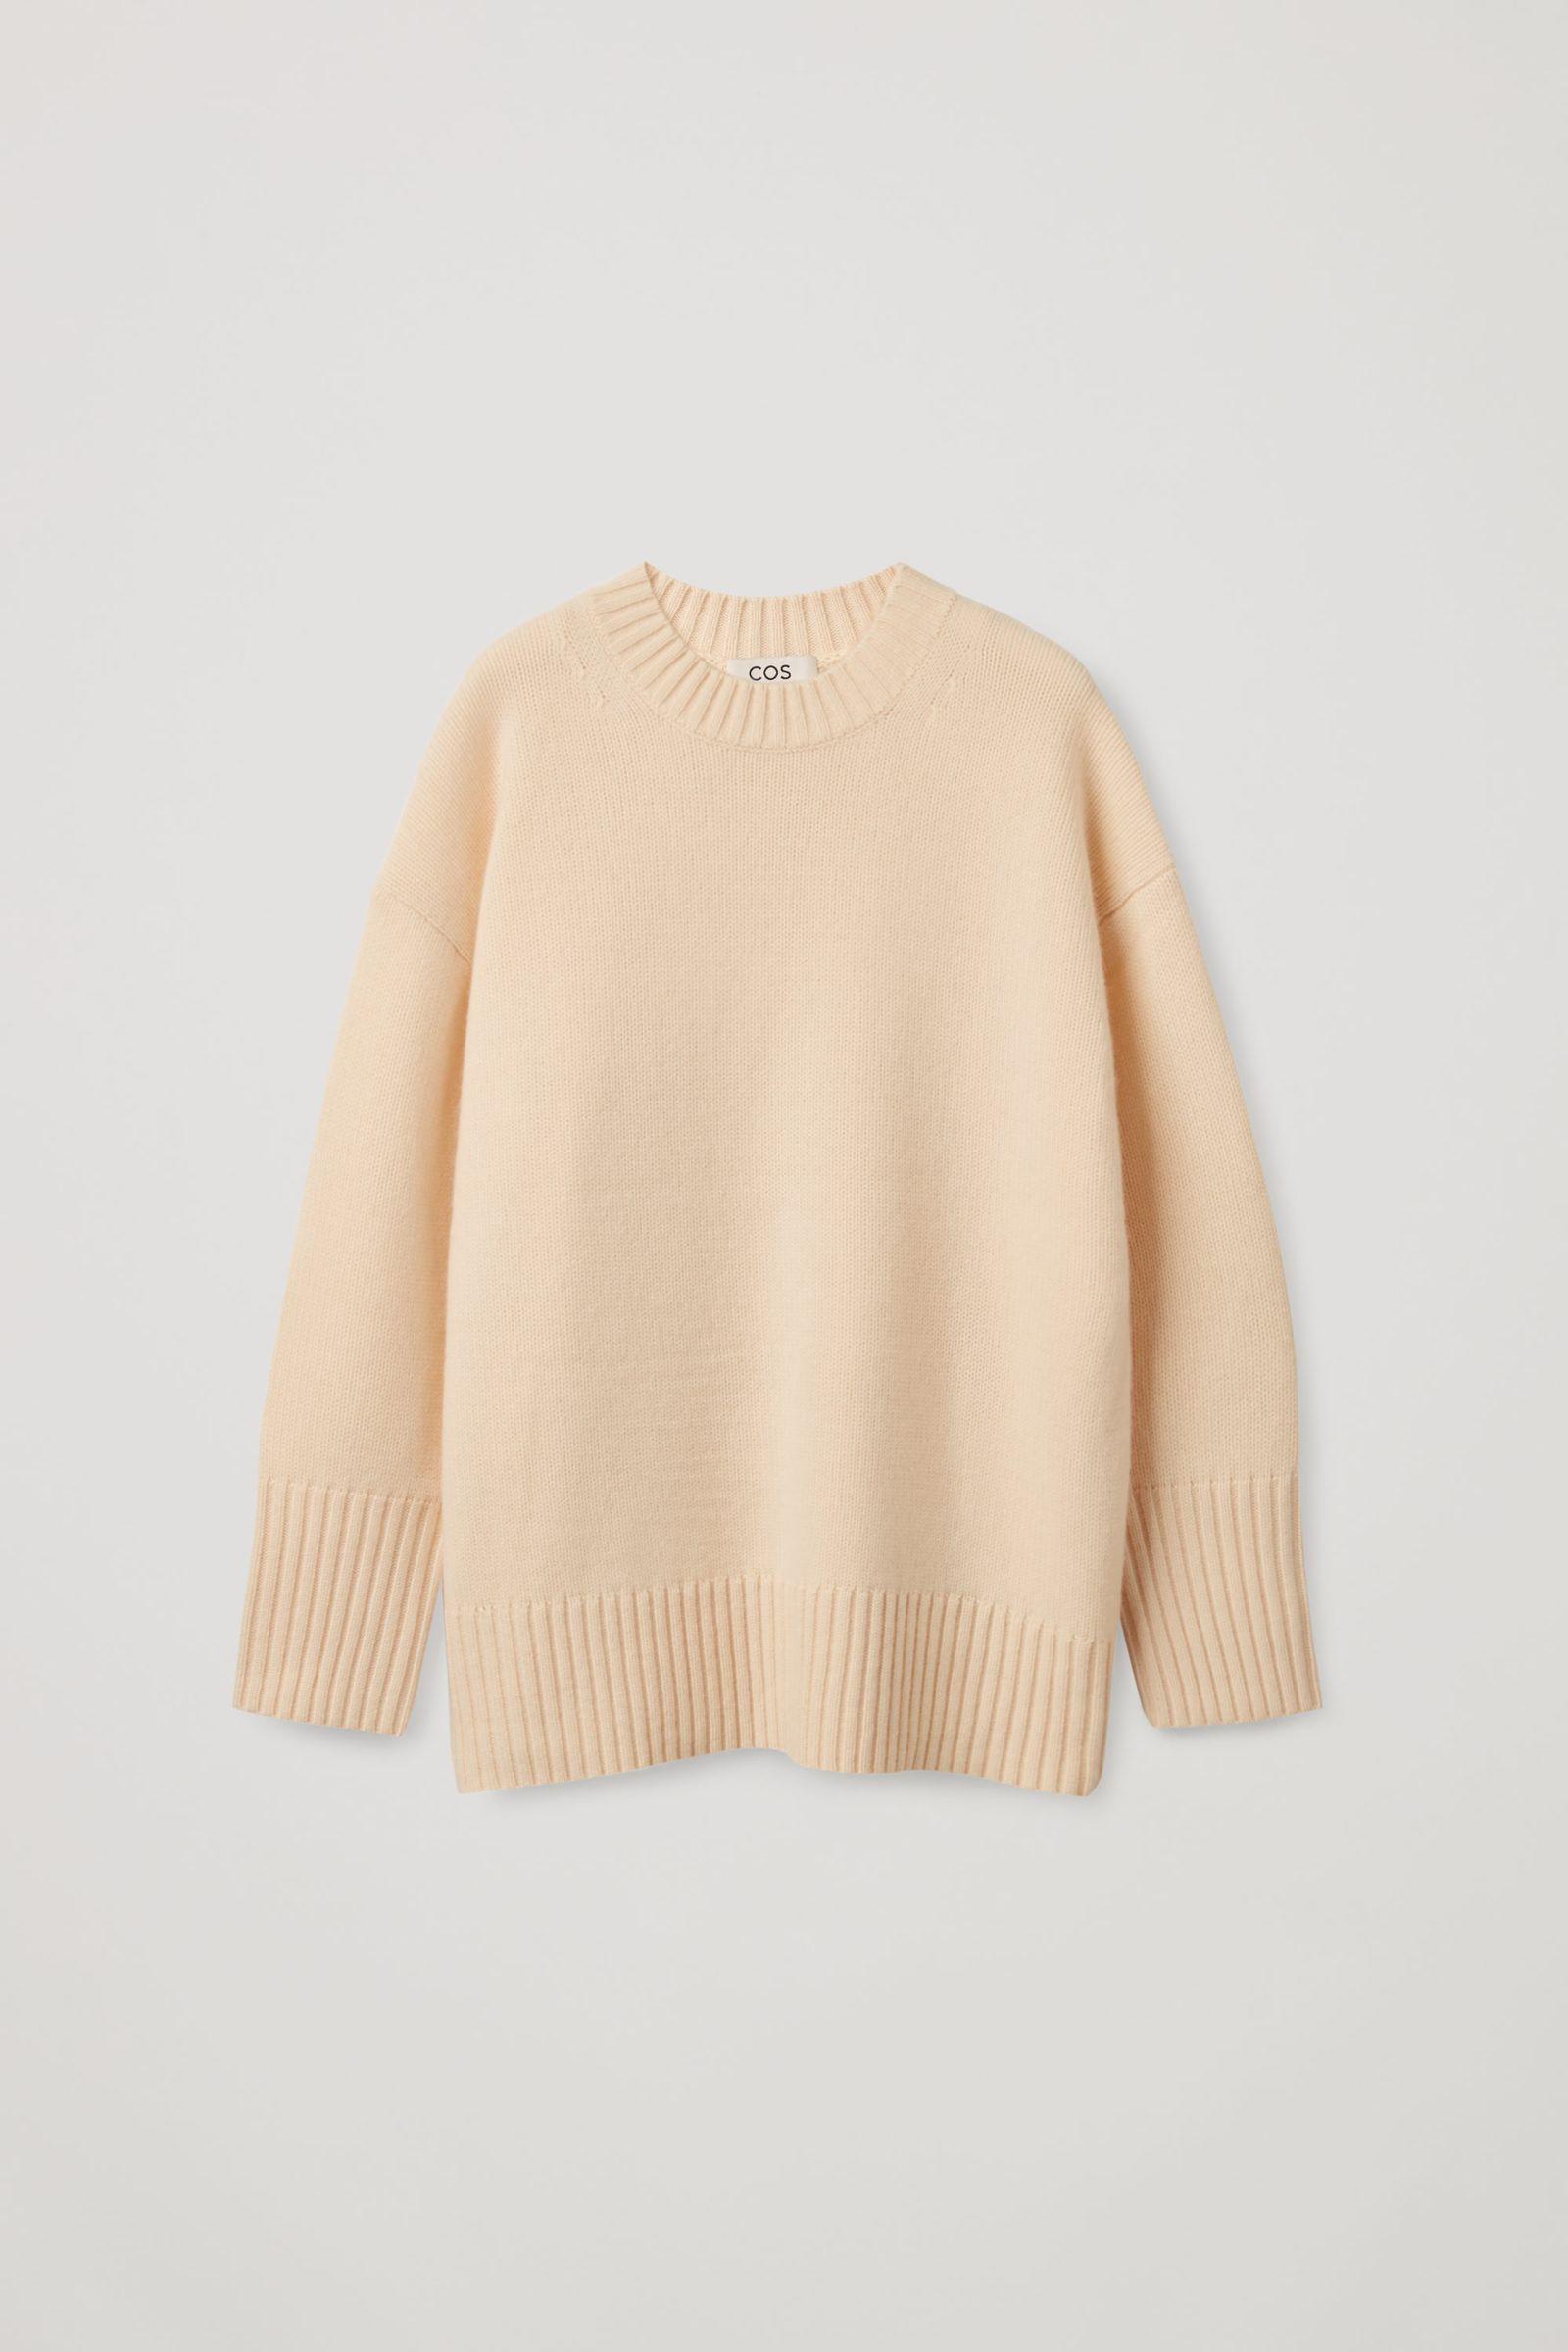 COS 오버사이즈 캐시미어 스웨터의 더스티 라이트 피치컬러 Product입니다.